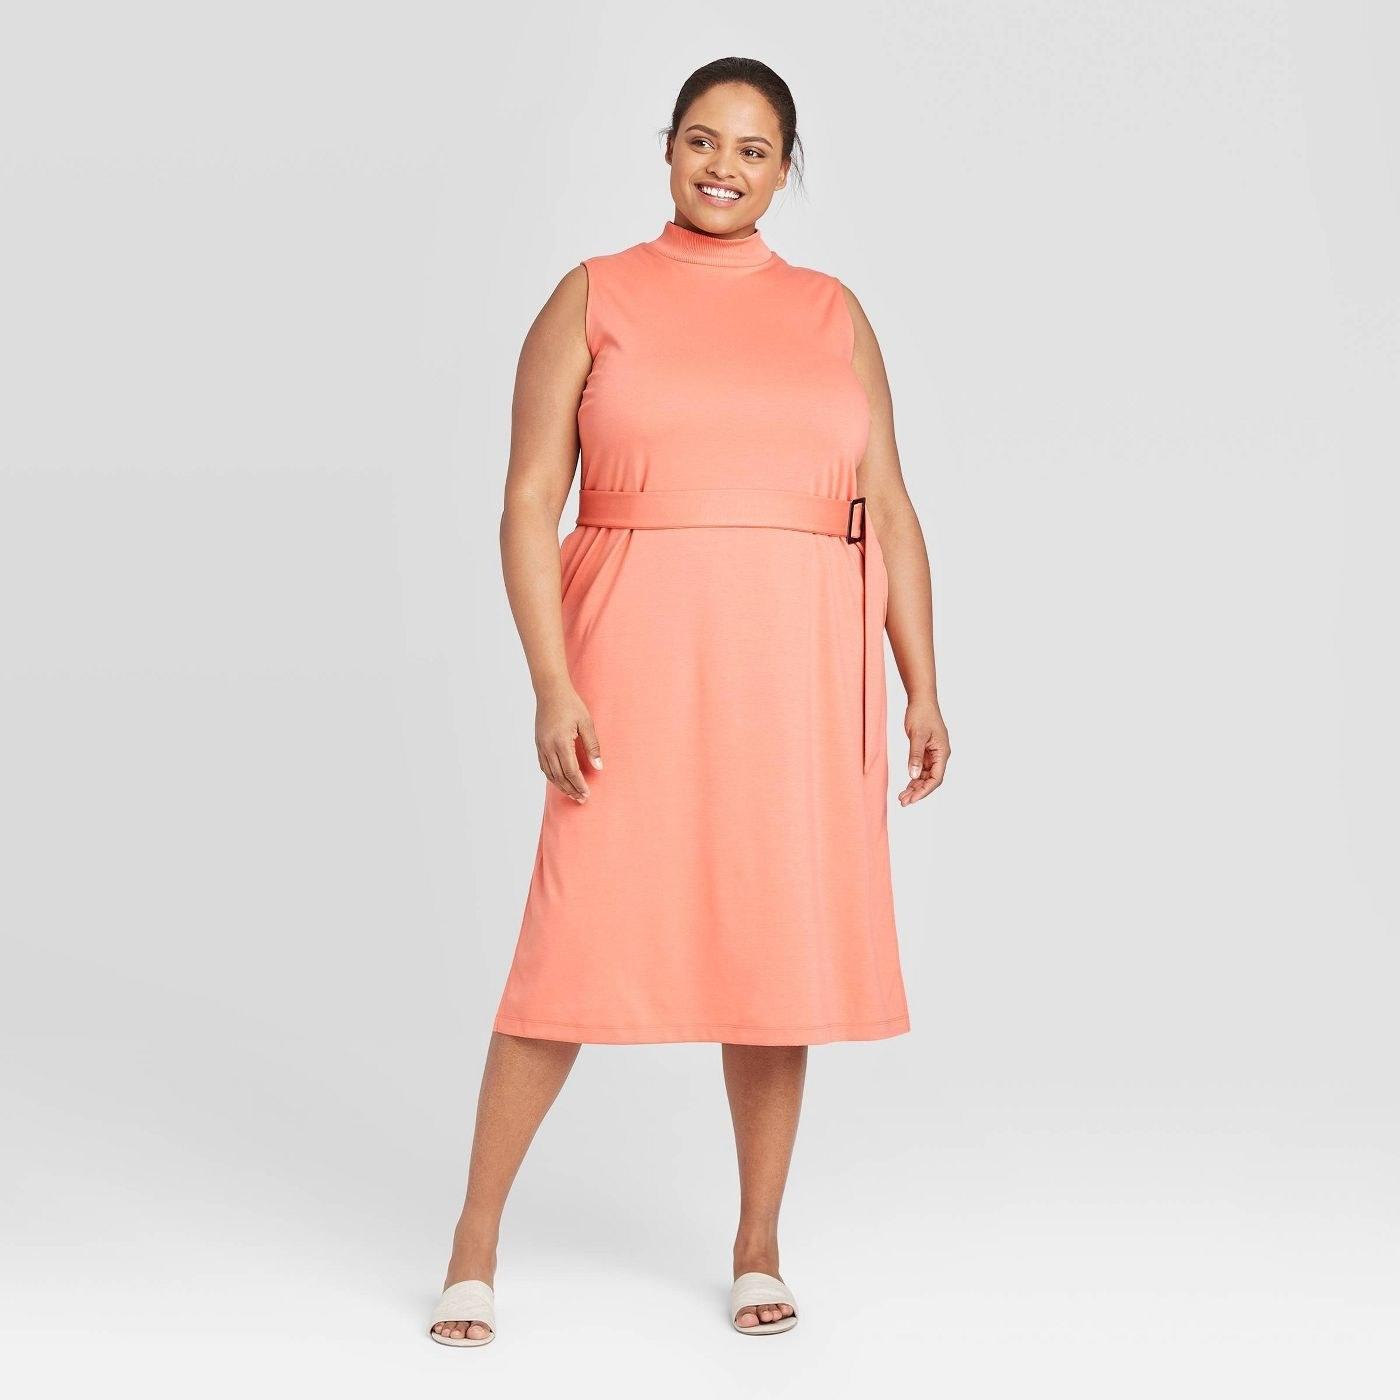 model wearing high-neck sleeveless orange midi dress